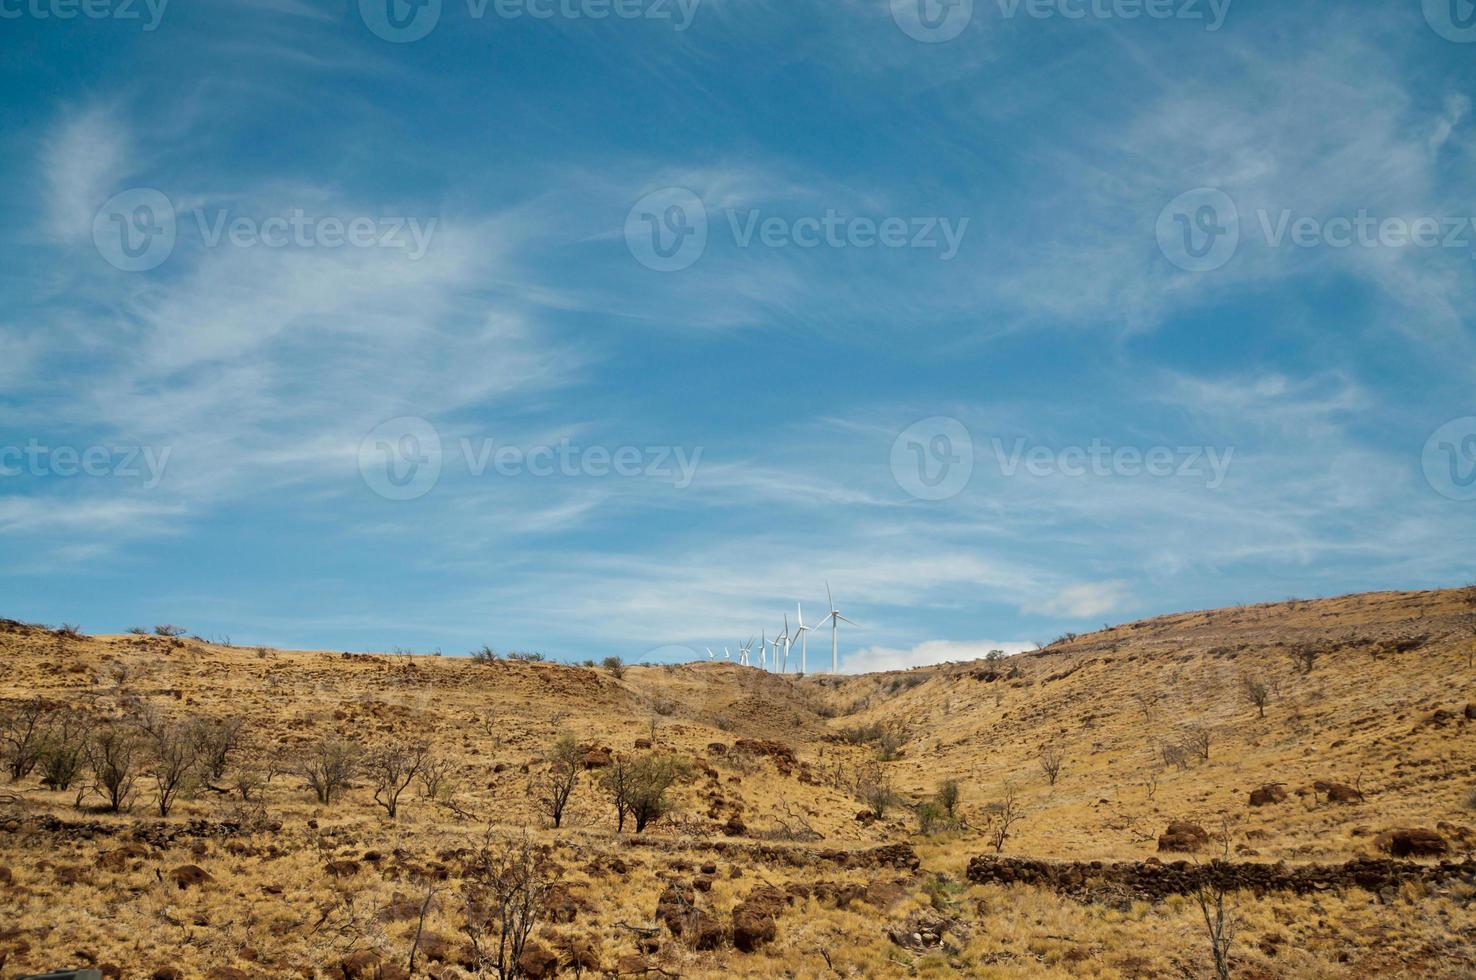 planta de energía eólica en una colina seca, maui foto